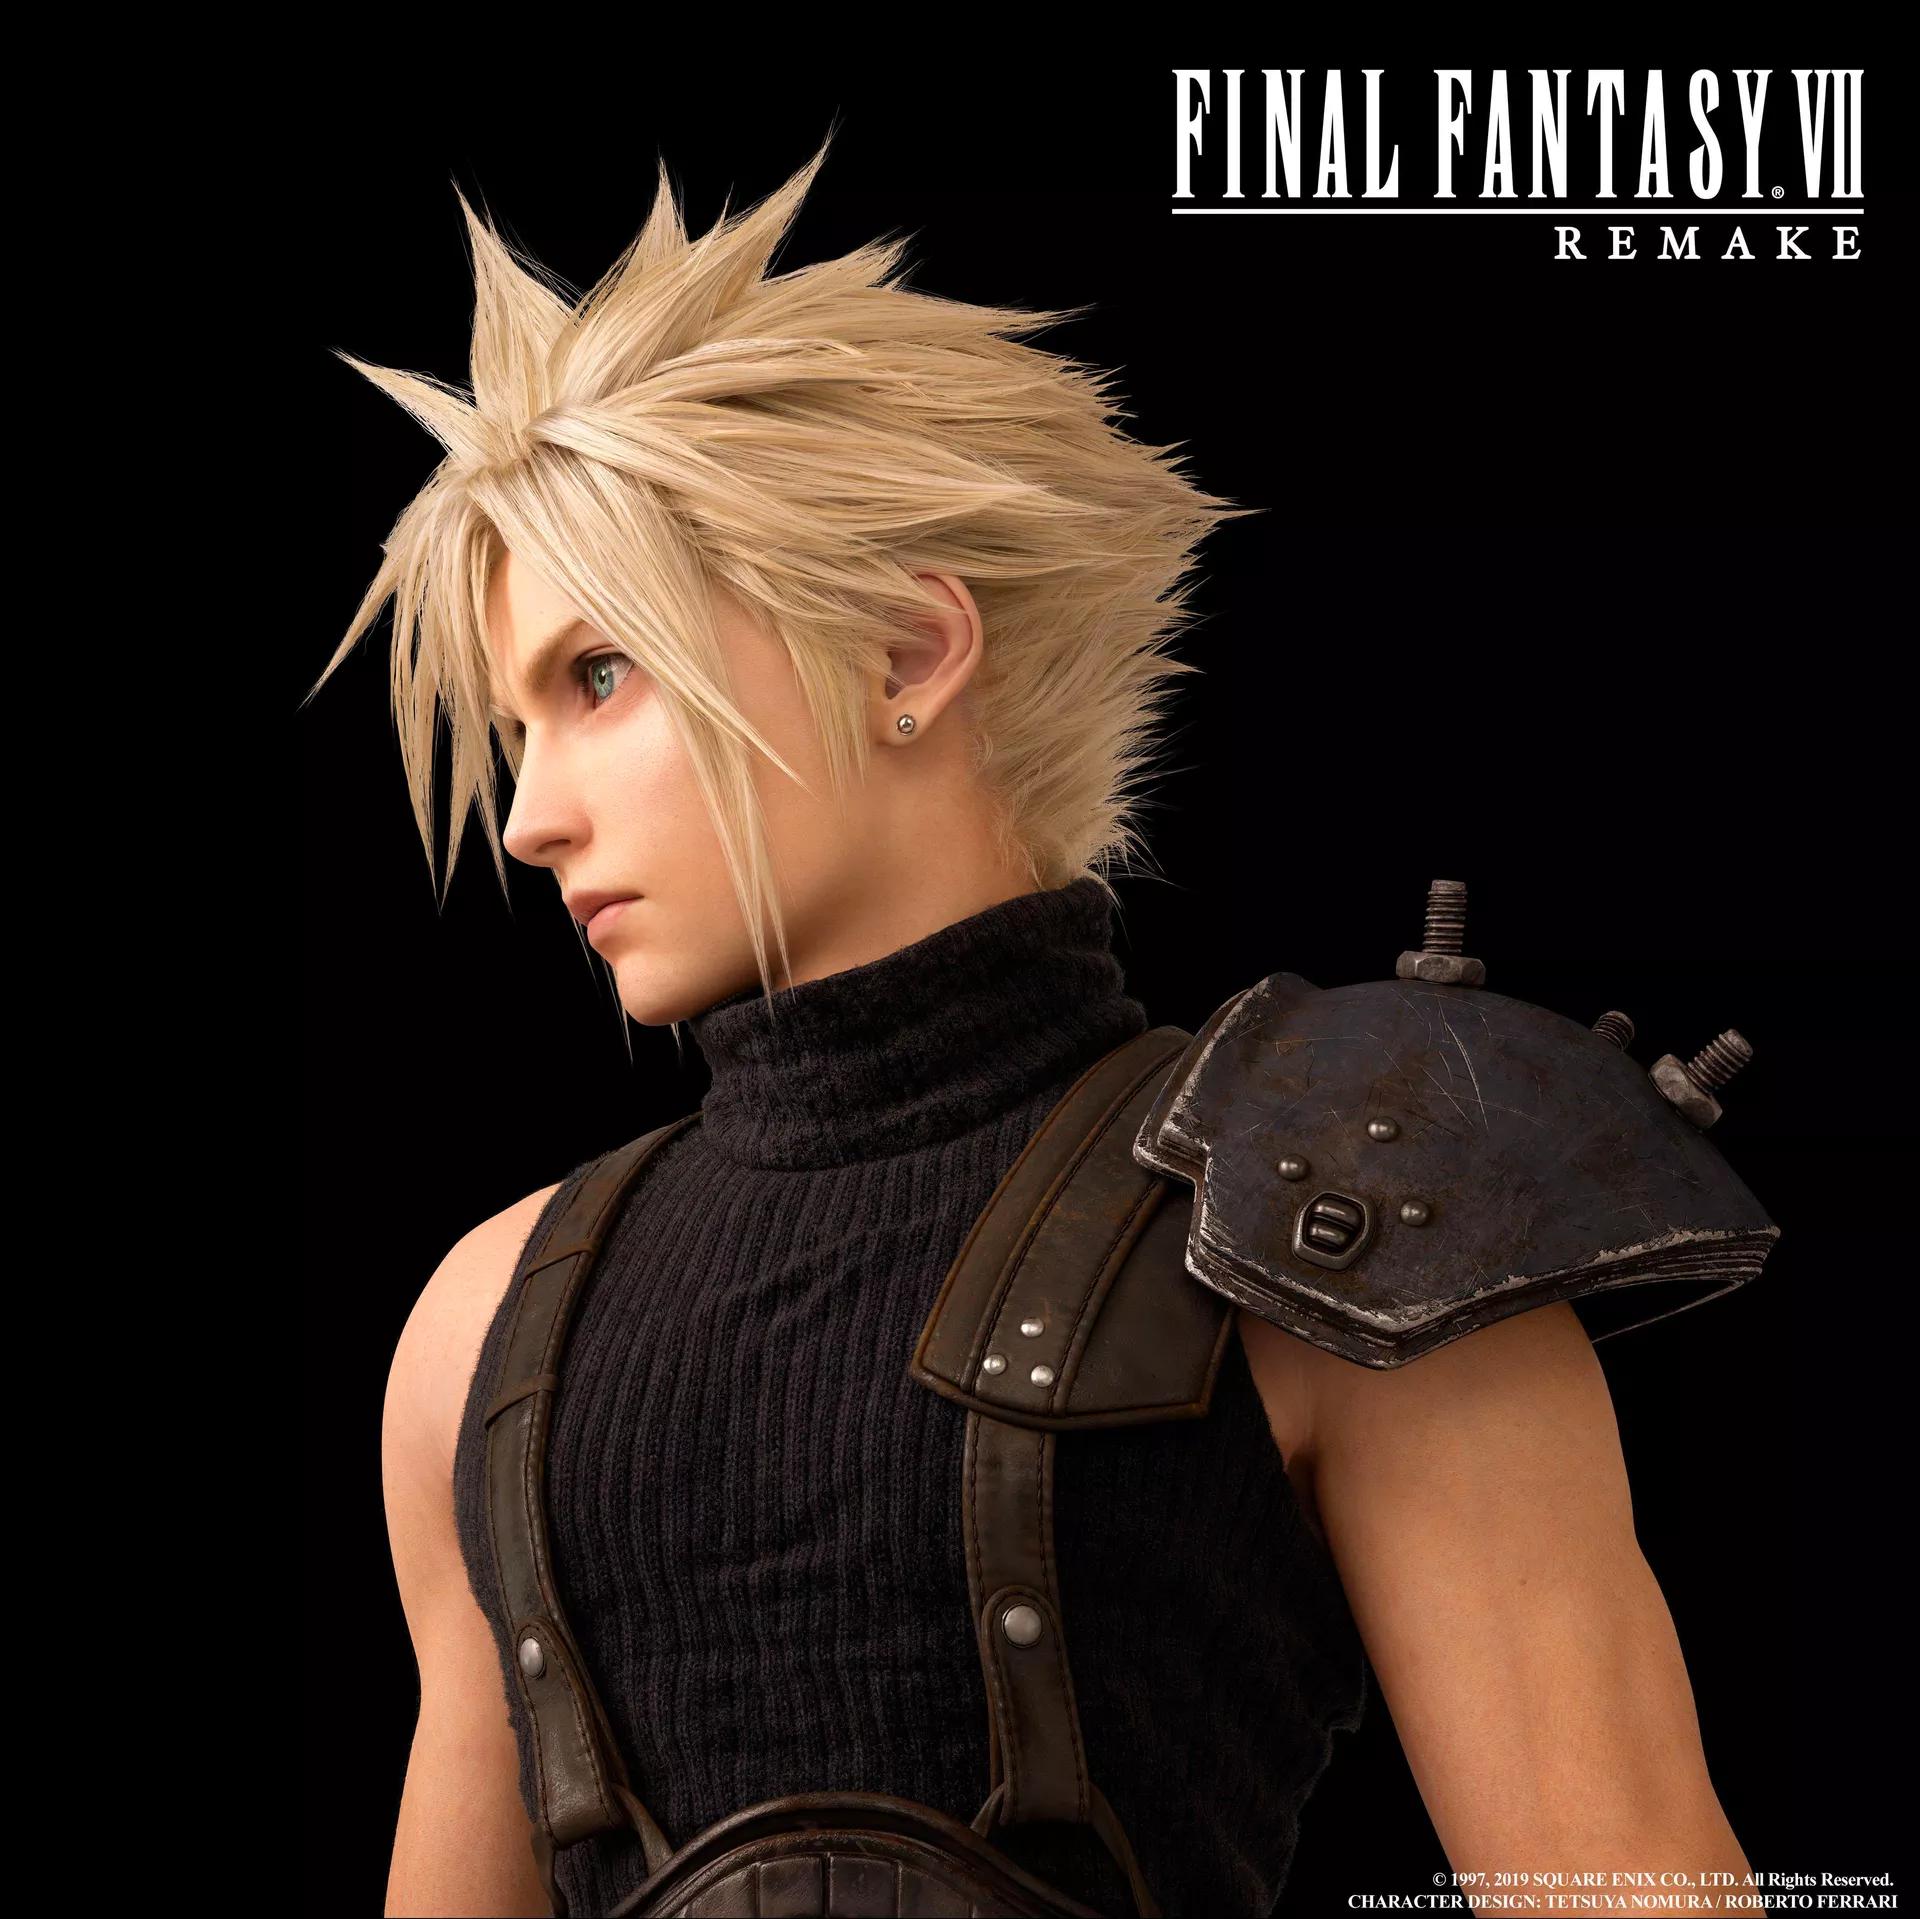 Pin By Erin On Randoms Final Fantasy Vii Remake Final Fantasy Final Fantasy Vii